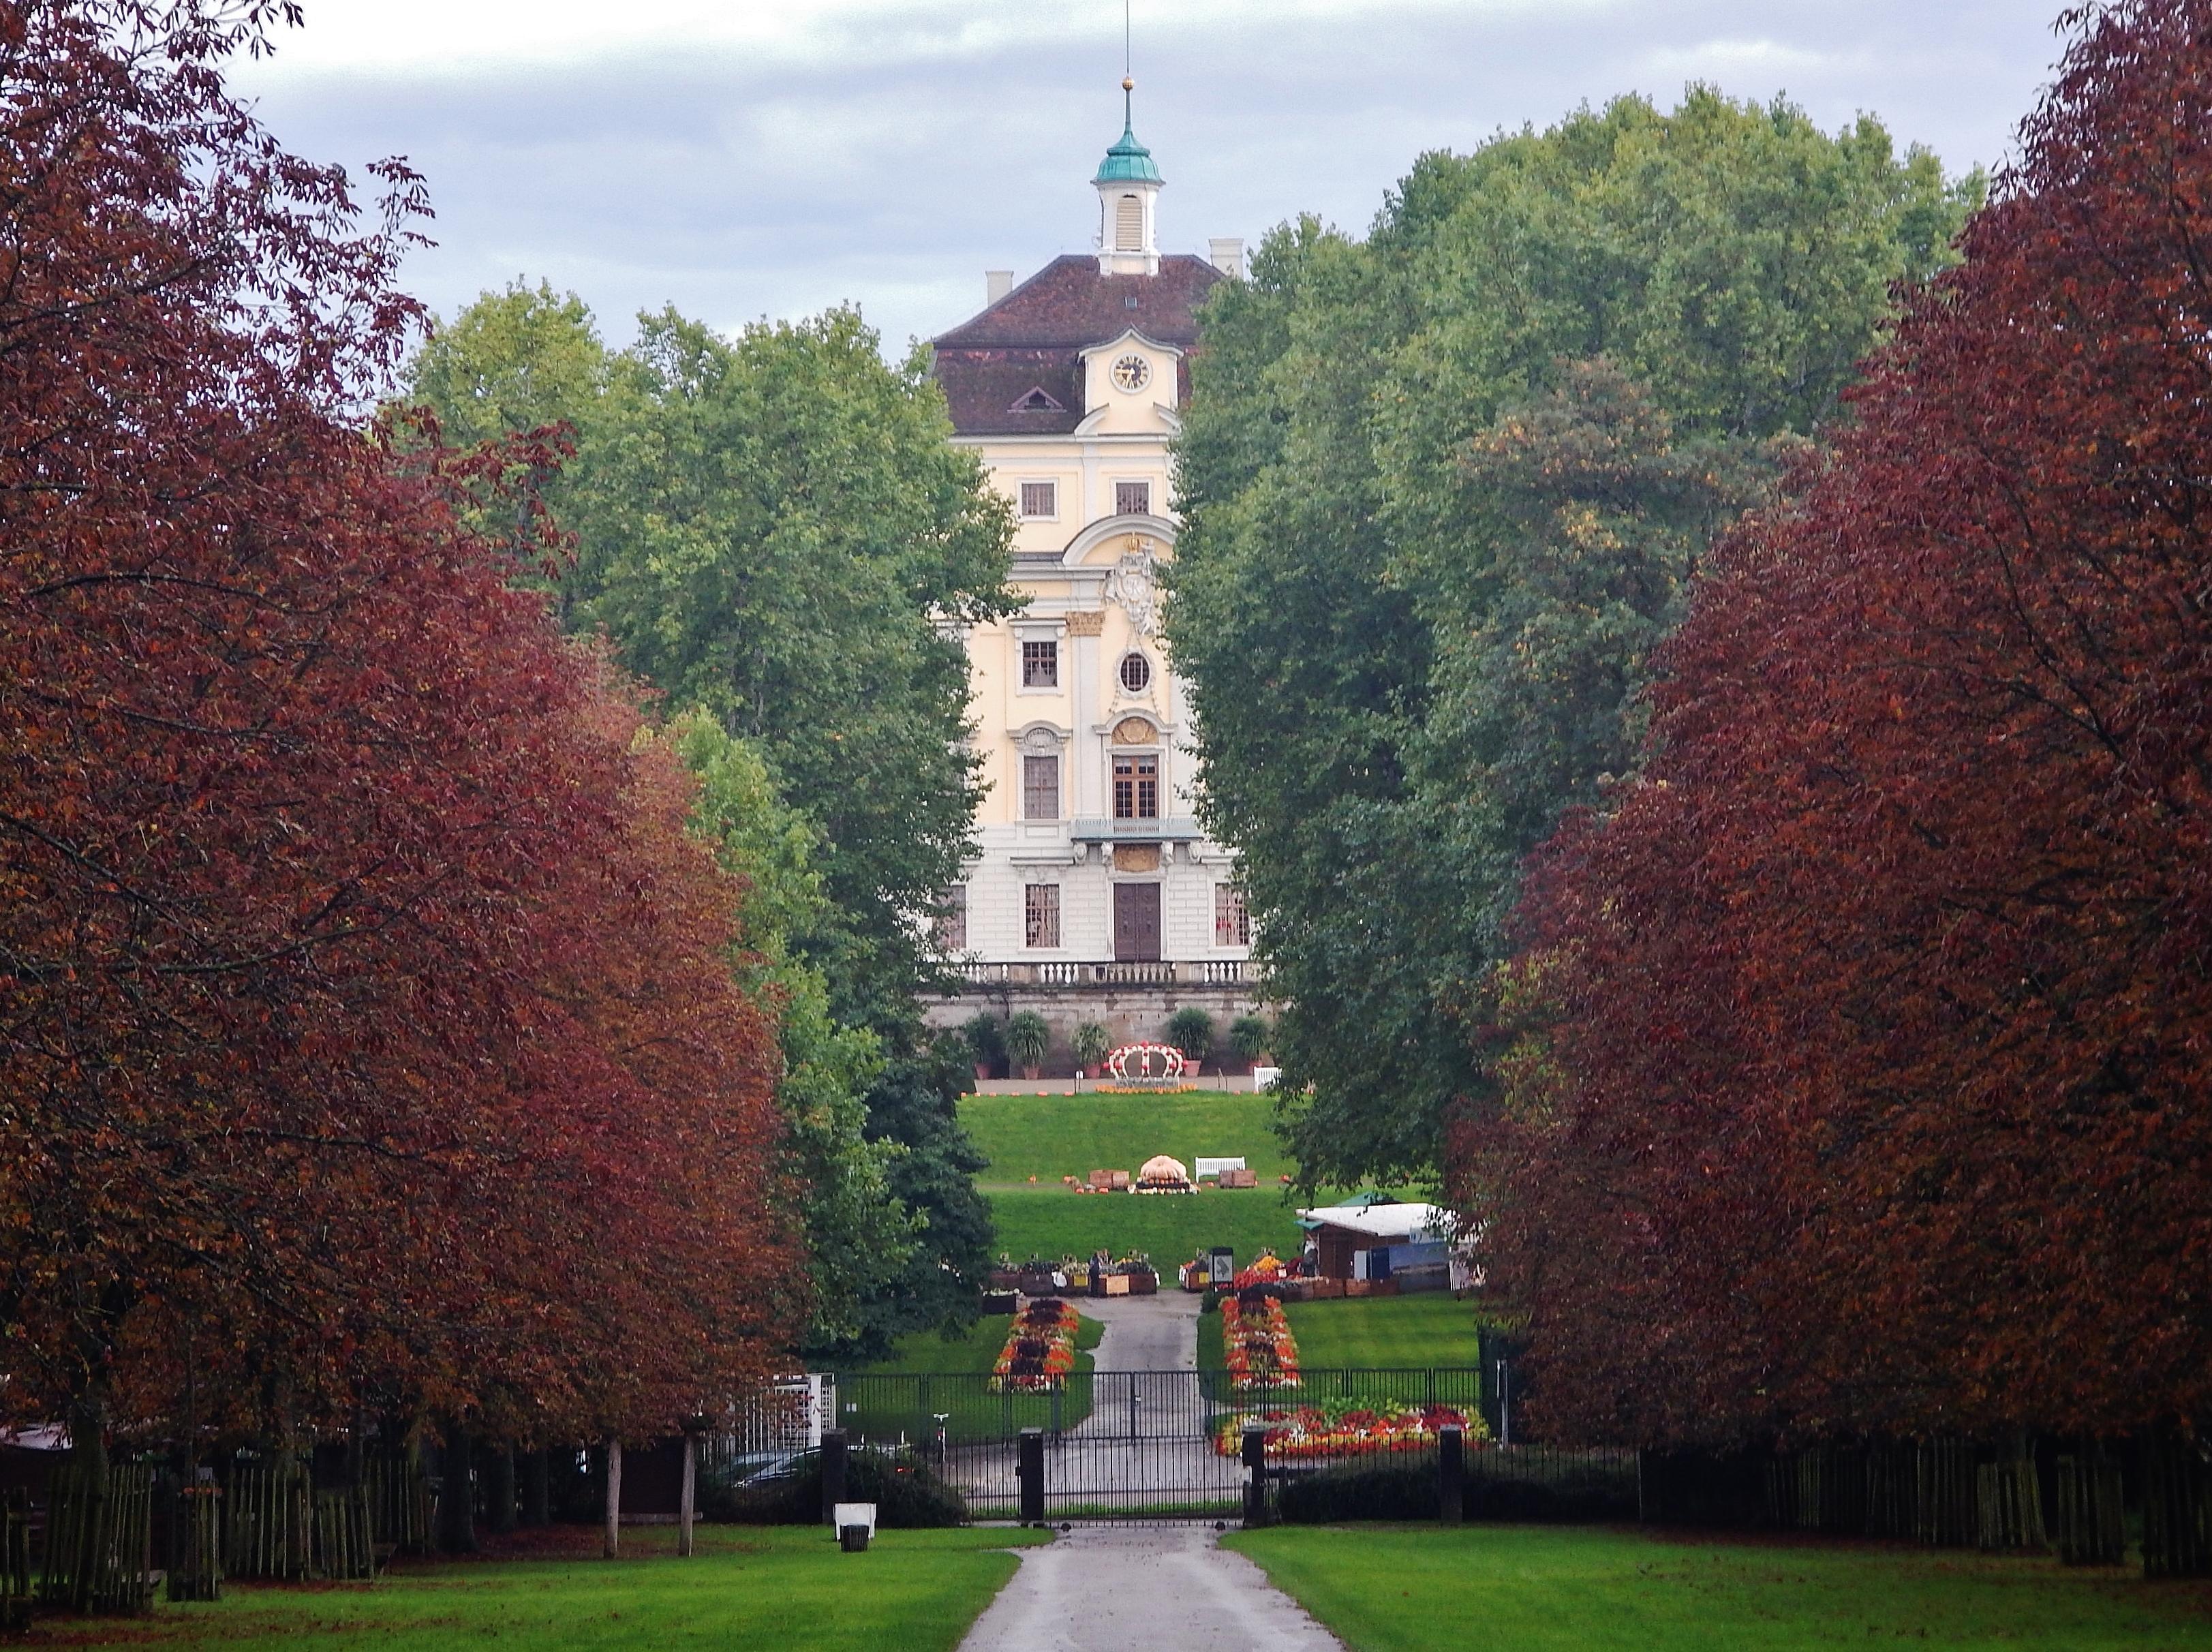 file blick auf das residenzschloss in ludwigsburg 1704 1733 herzog eberhard ludwig von. Black Bedroom Furniture Sets. Home Design Ideas